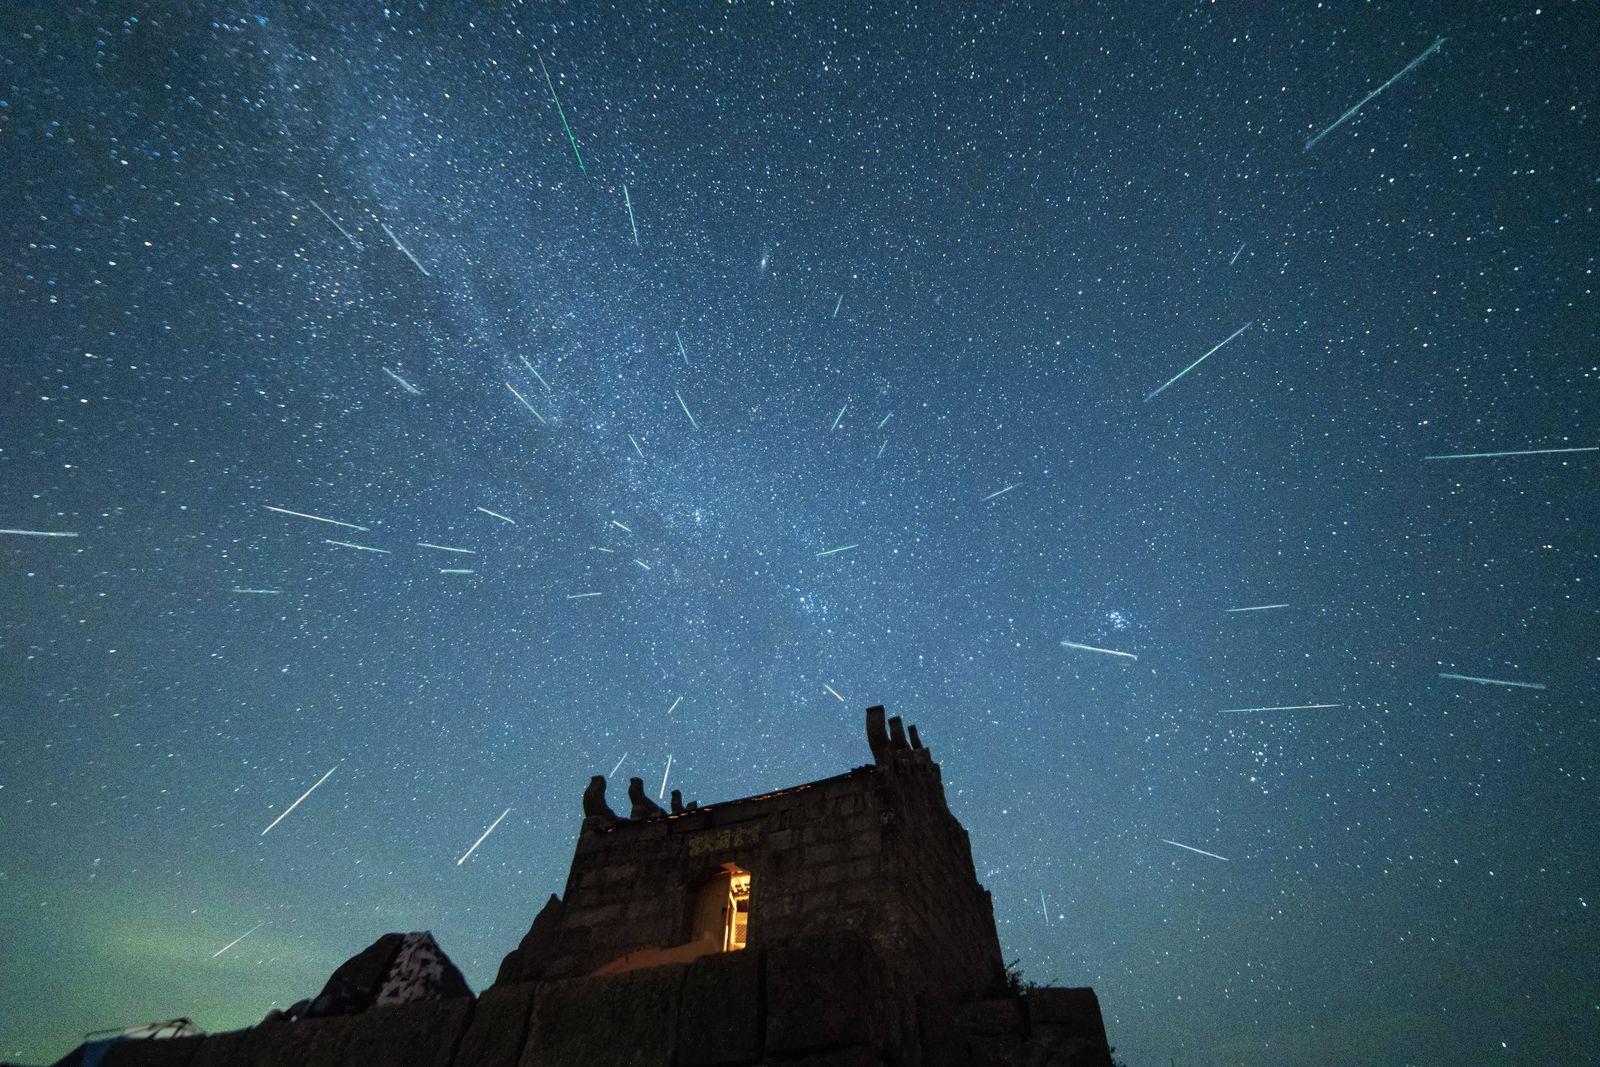 Perseid meteor shower in Yuhua Mountain PUBLICATIONxNOTxINxCHN 461259962732773400